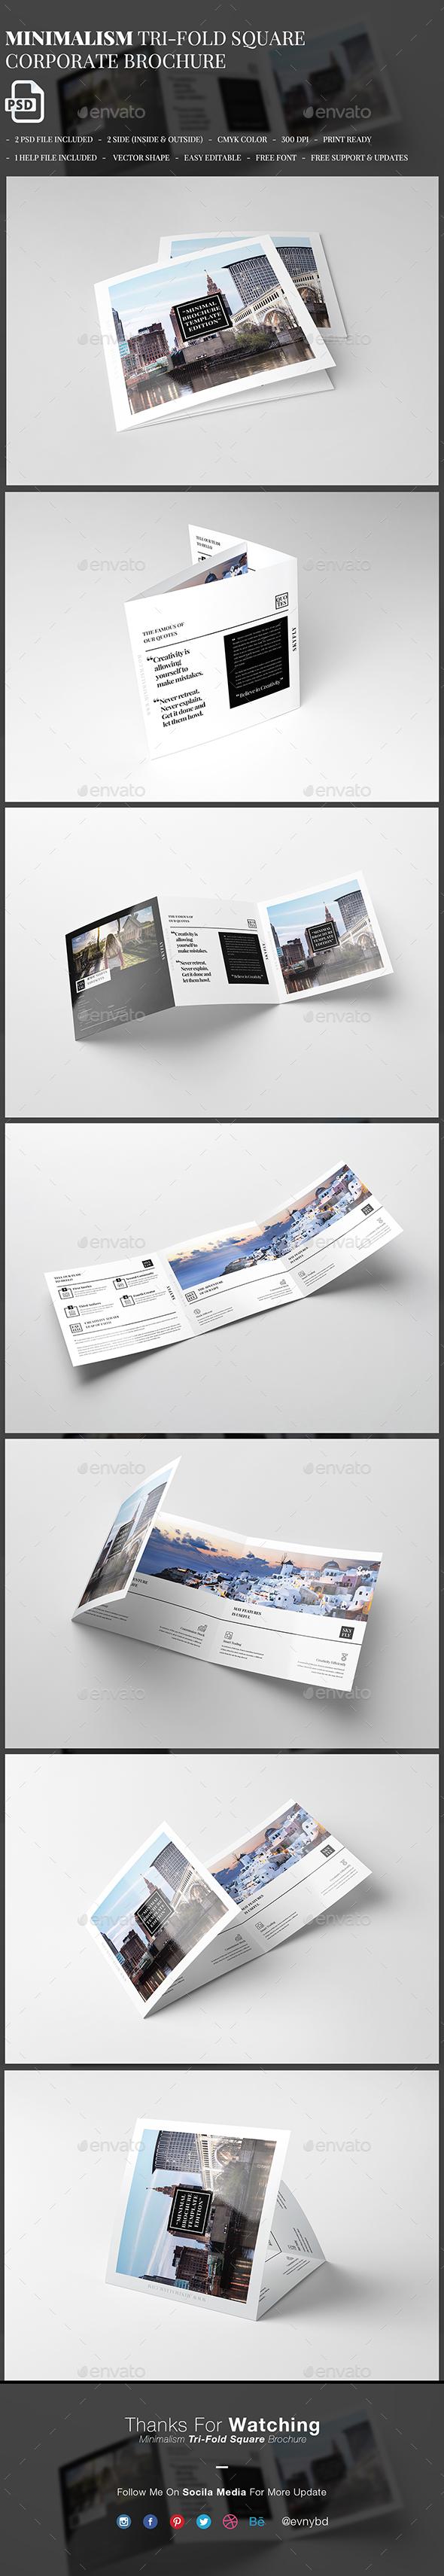 Minimalism Square Tri-Fold Brochure - Brochures Print Templates